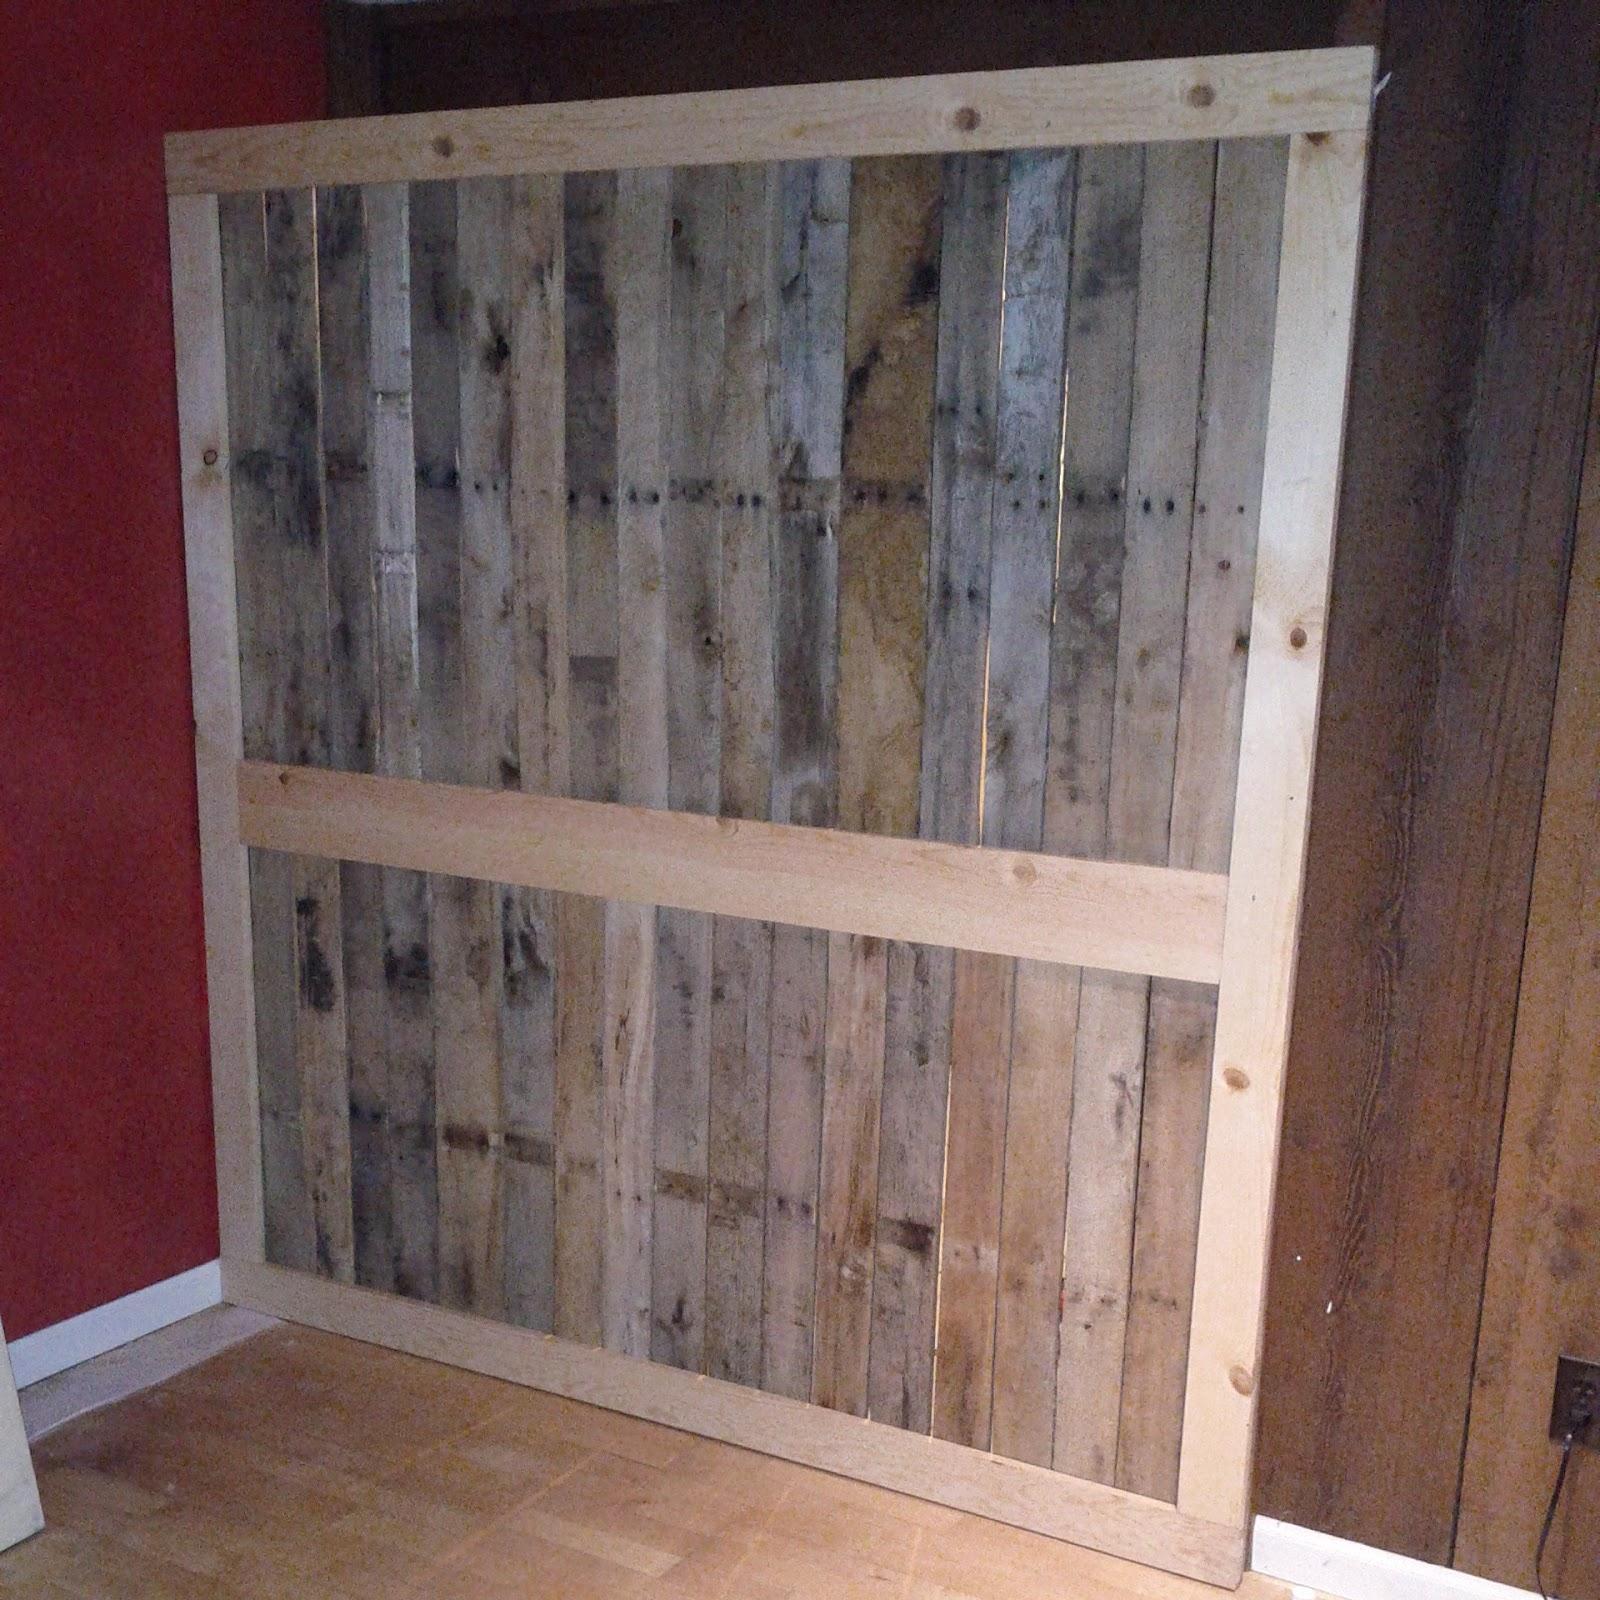 Building Sliding Barn Door Diy: Baker & Brackenridge: DIY Barn Door Project